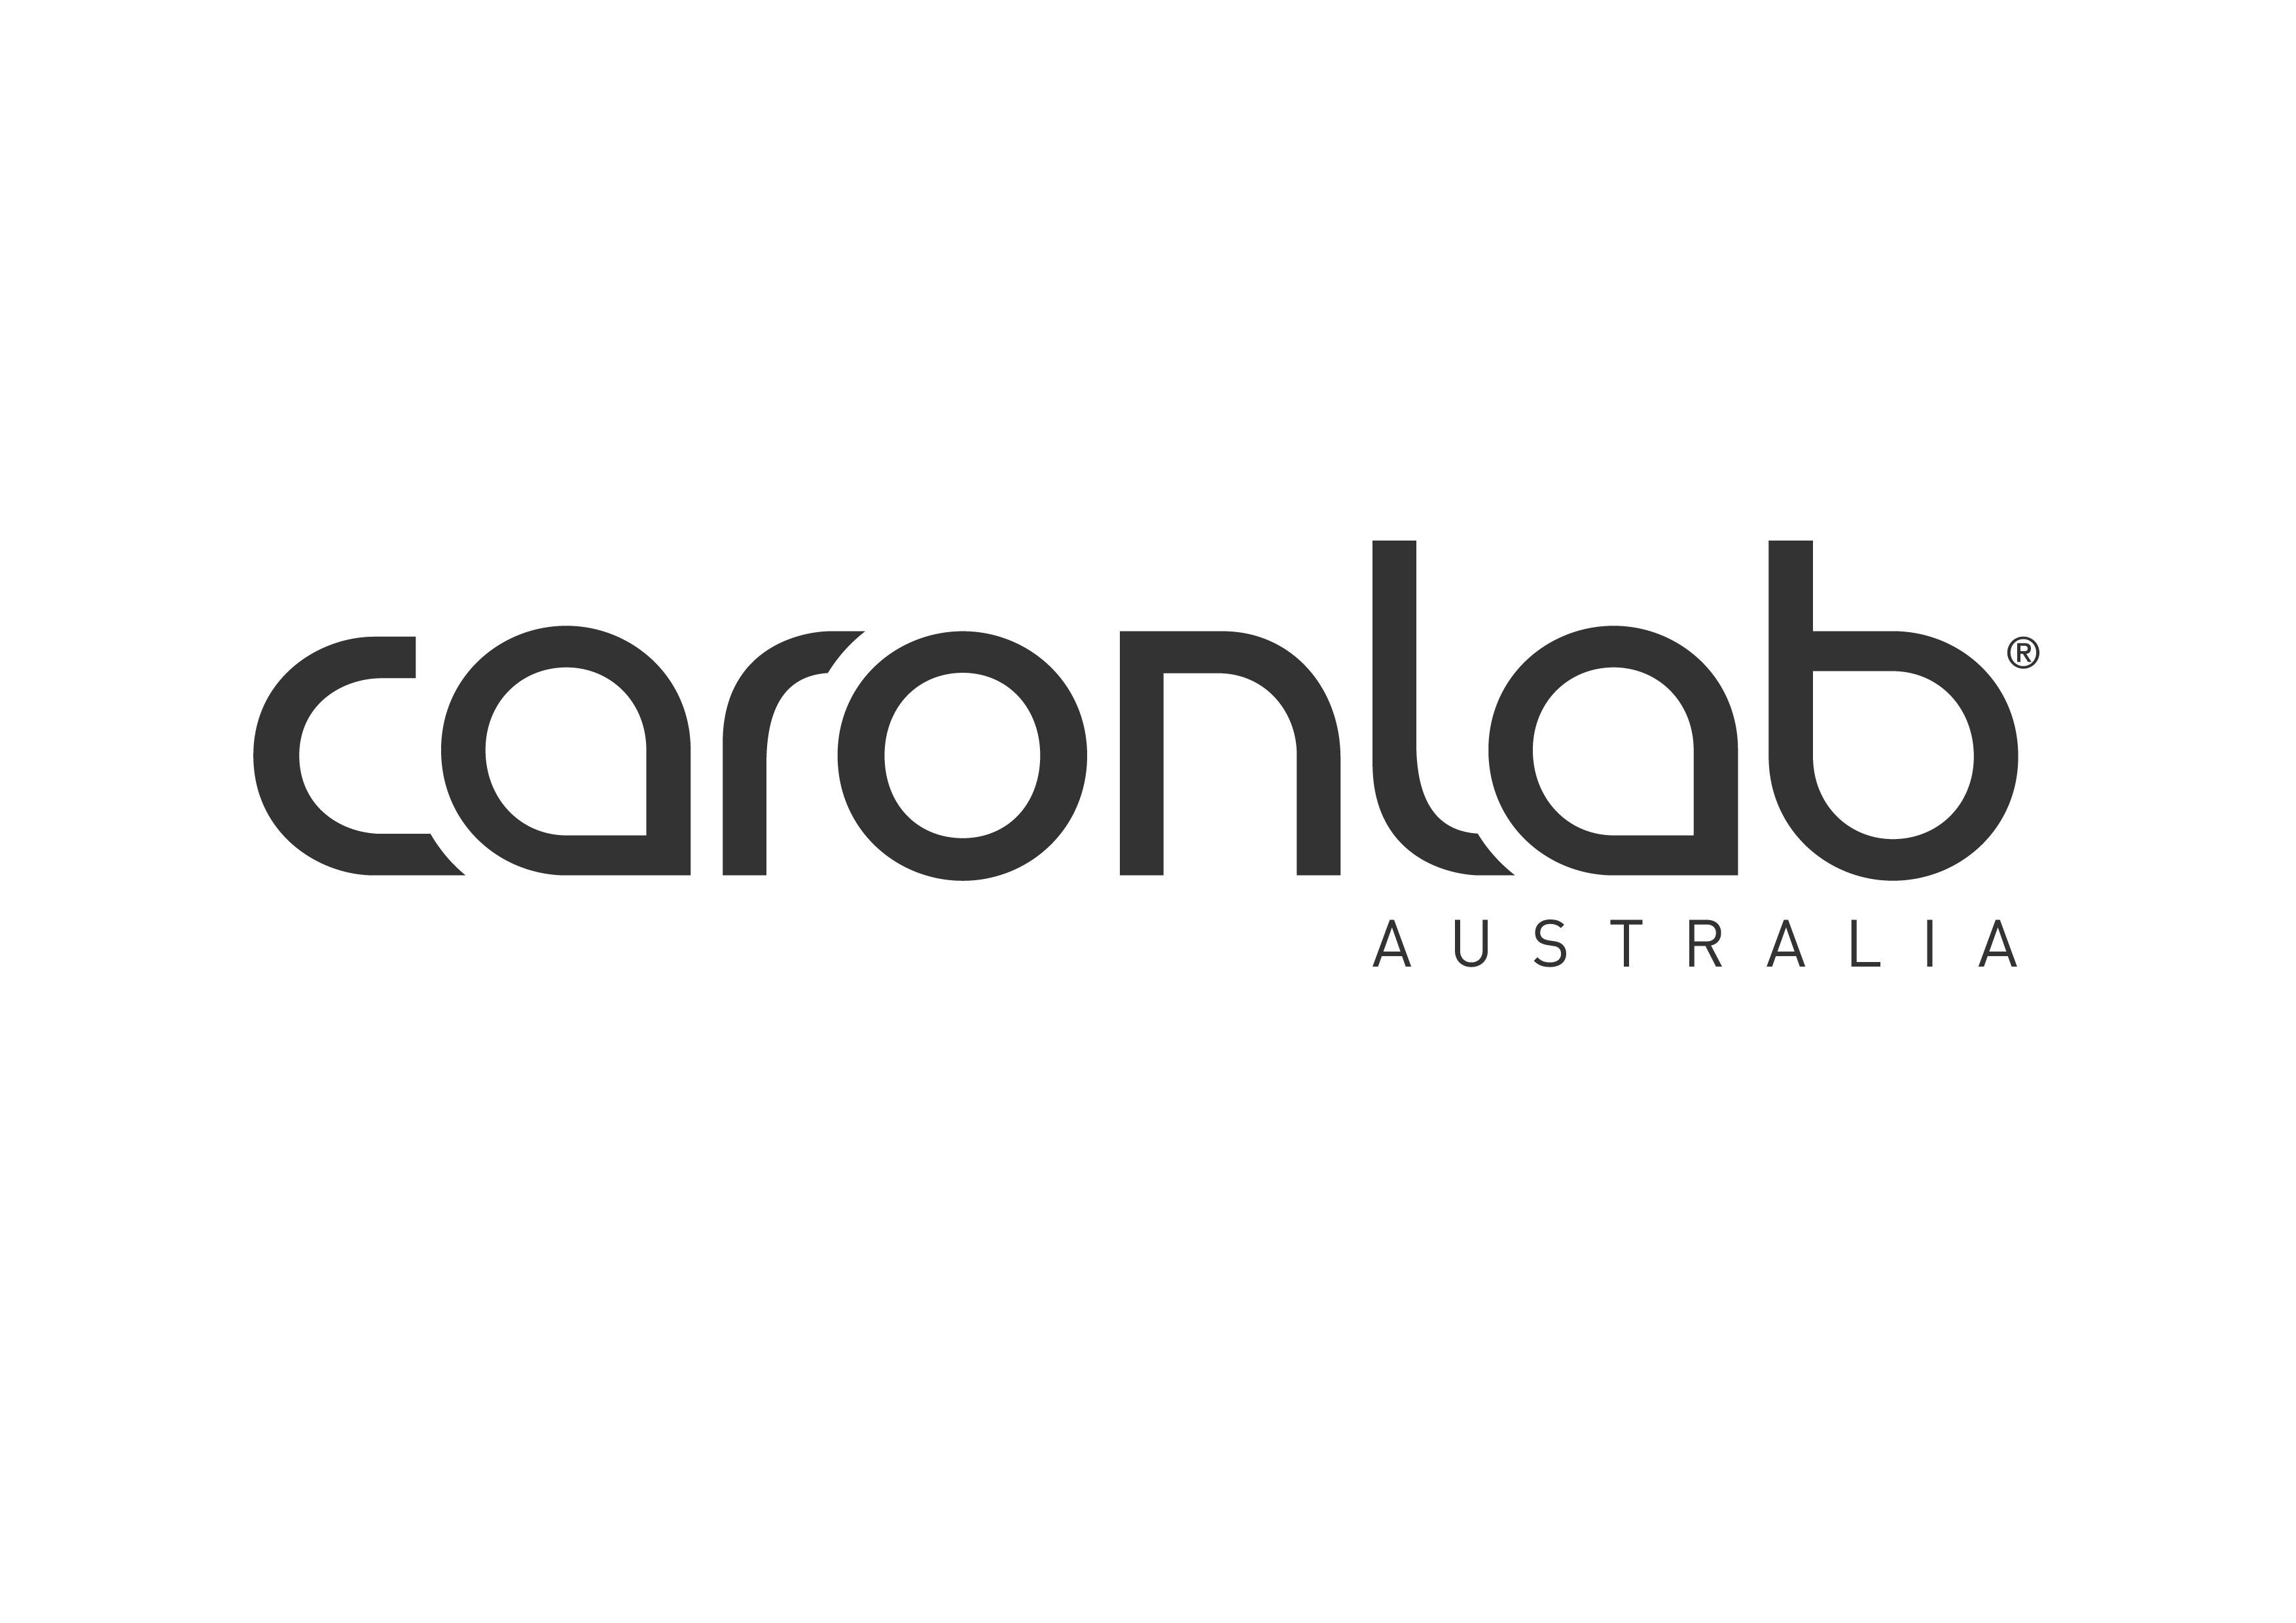 LOGO-Caronlab-Australia-GREY1[1]